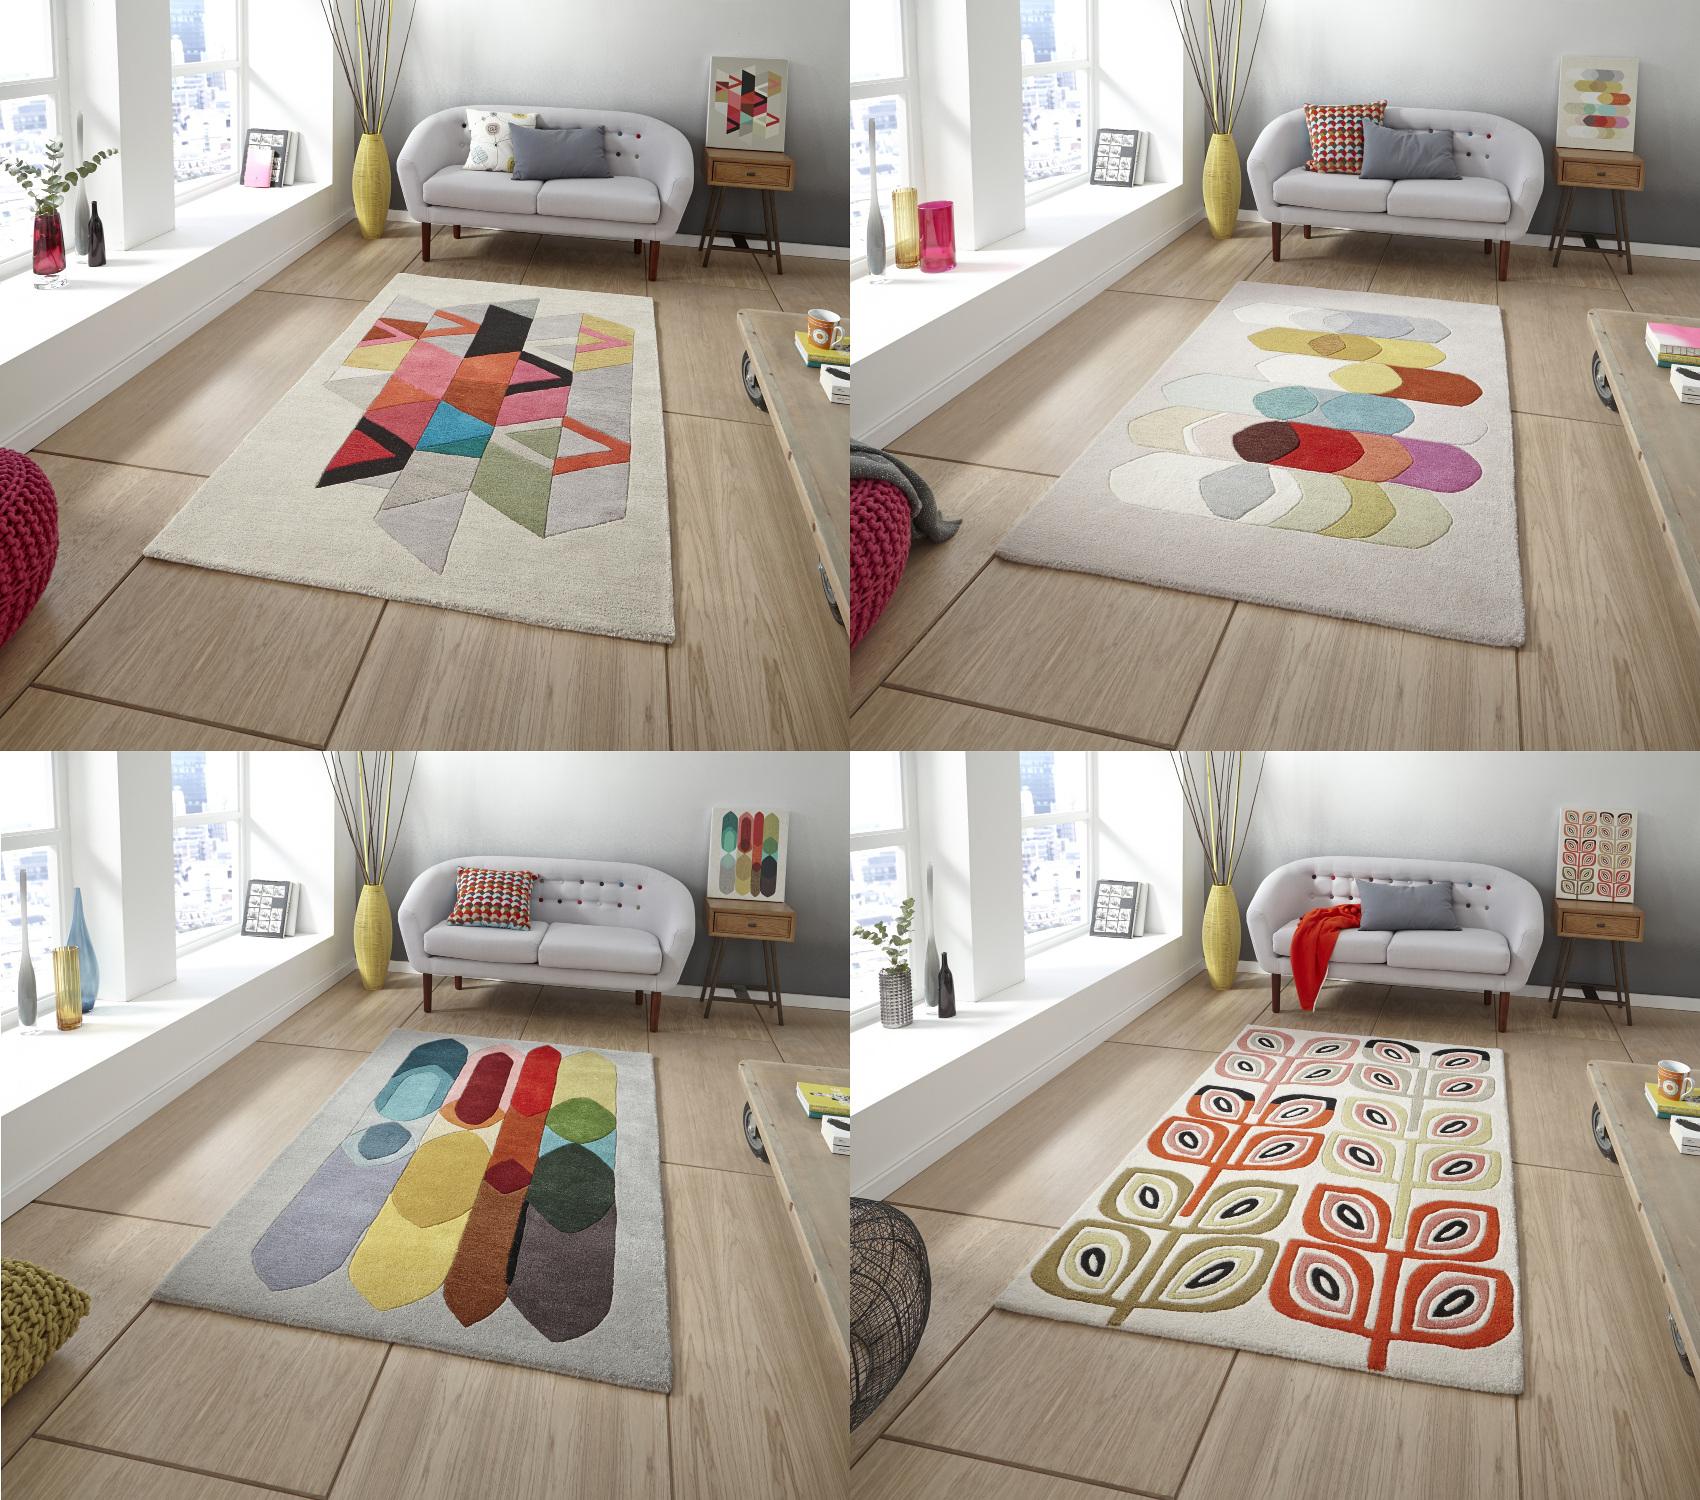 Designer Wool Blend Rug Inaluxe Bold Multi Coloured Large